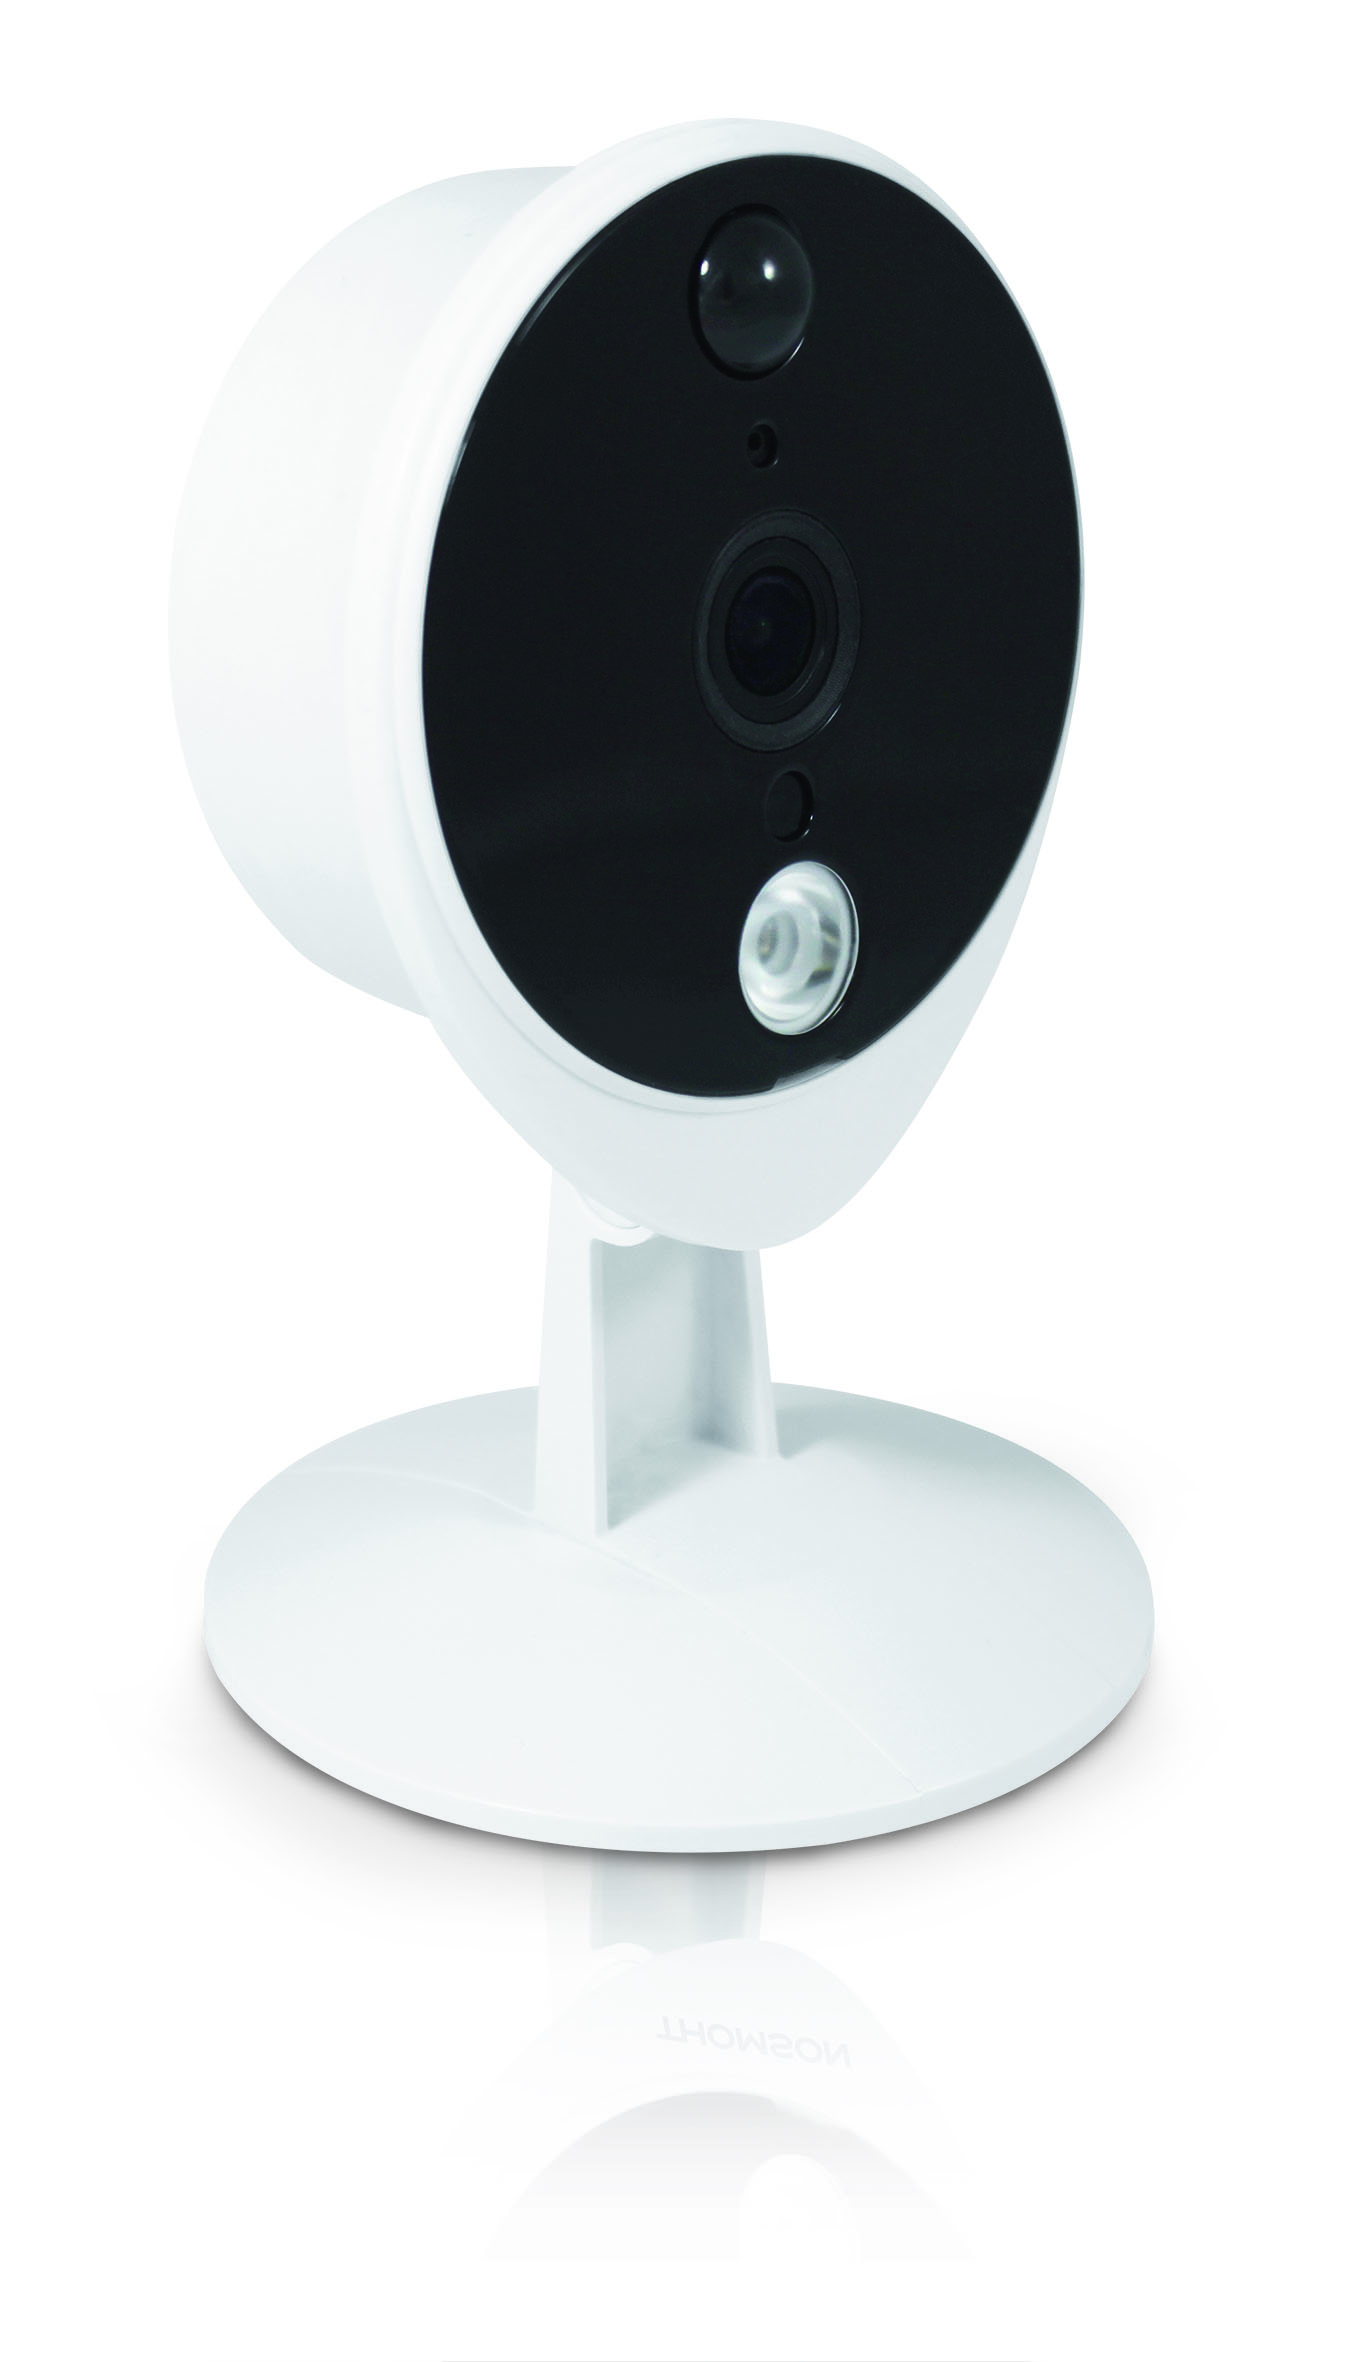 Cam ra ip wifi 1080p couleur hd usage int rieur maisonic - Camera wifi interieur ...